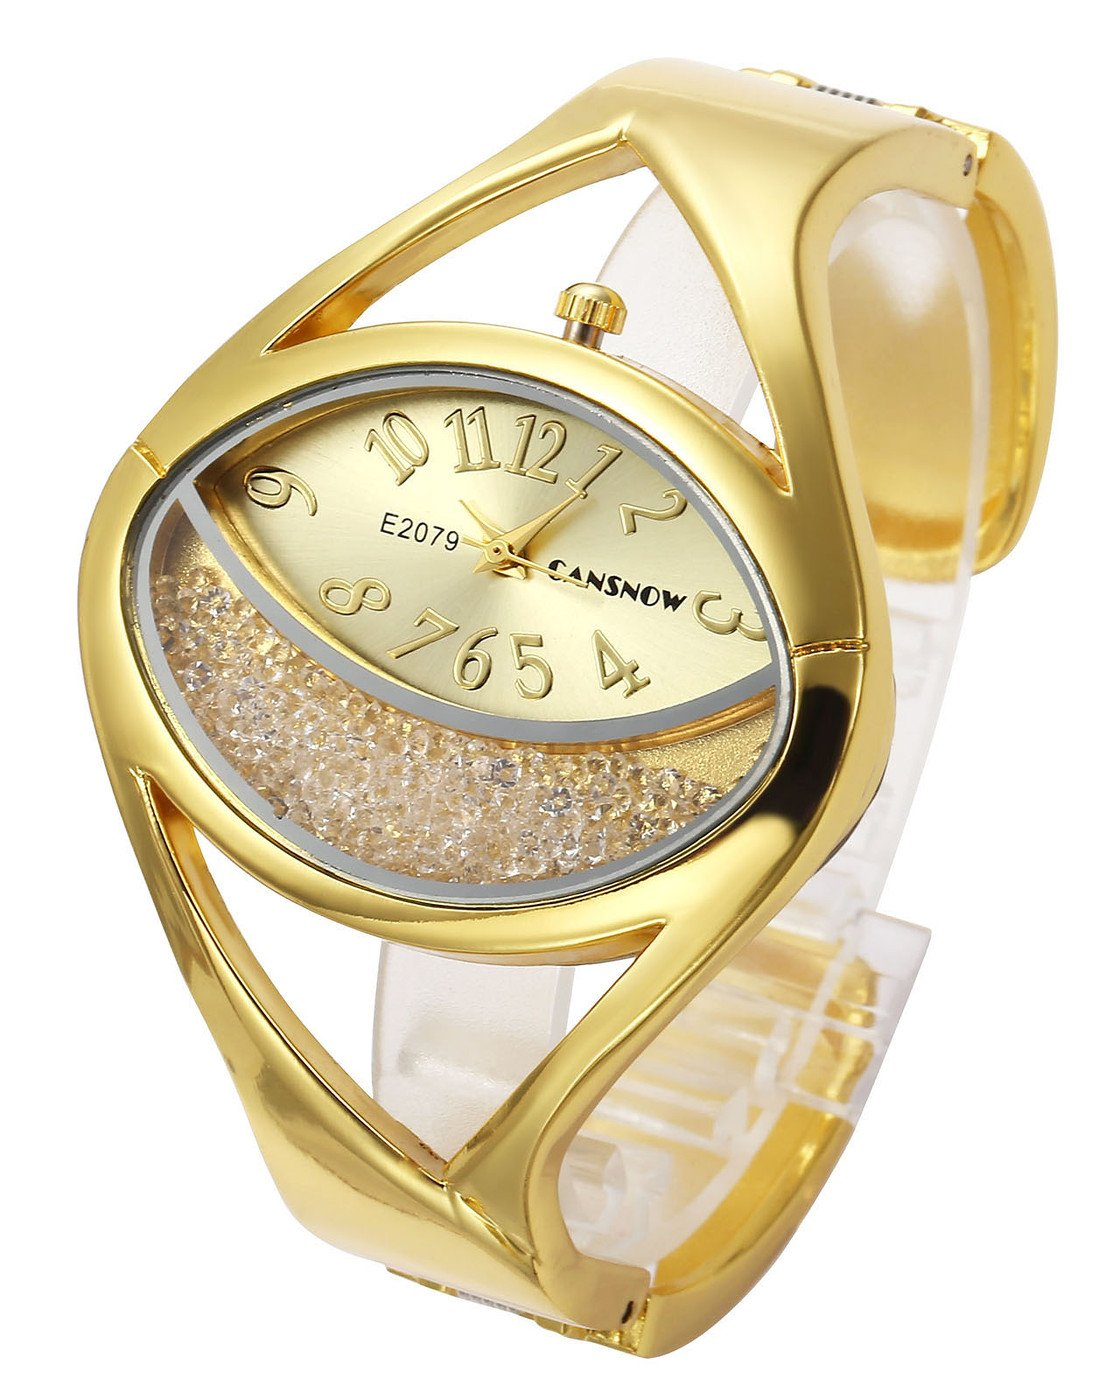 Top Plaza Women Ladies Casual Luxury Gold Silver Tone Alloy Analog Quartz Bracelet Watch Oval Case Rhinestones Decorated Elegant Dress Bangle Cuff Wristwatch-Gold #2